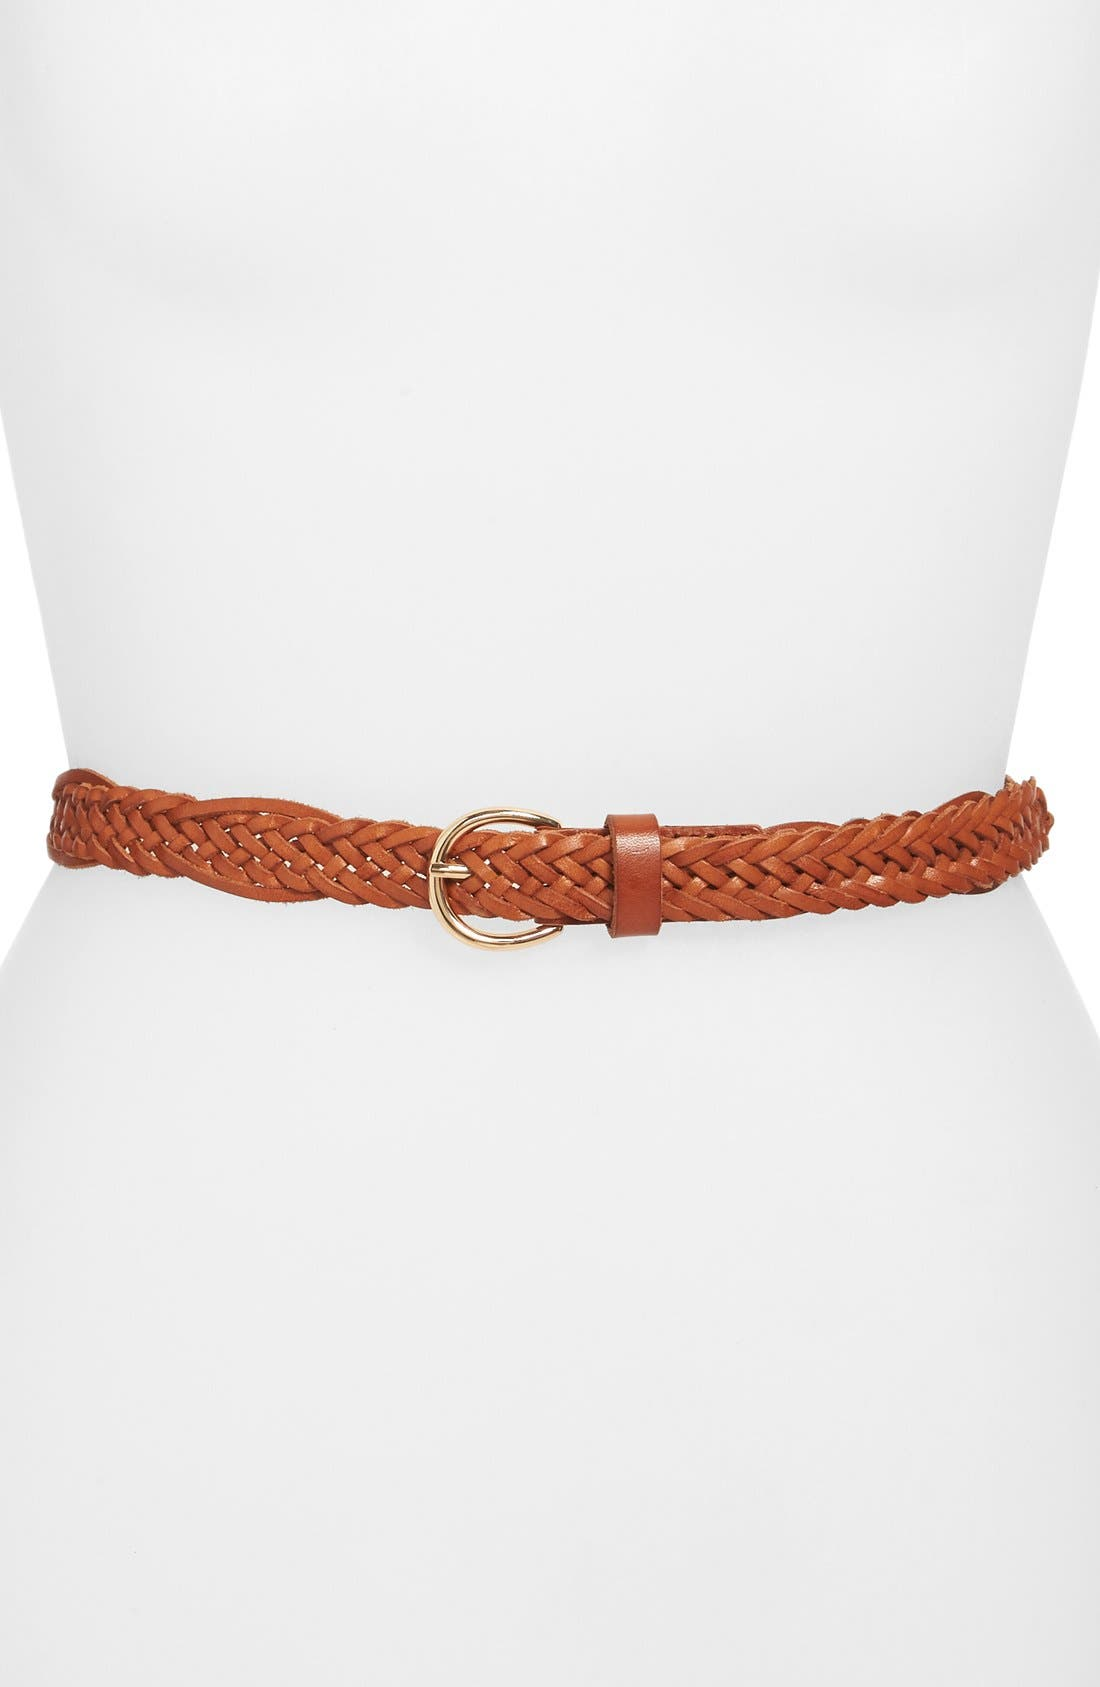 Alternate Image 1 Selected - Halogen® Skinny Braided Leather Belt